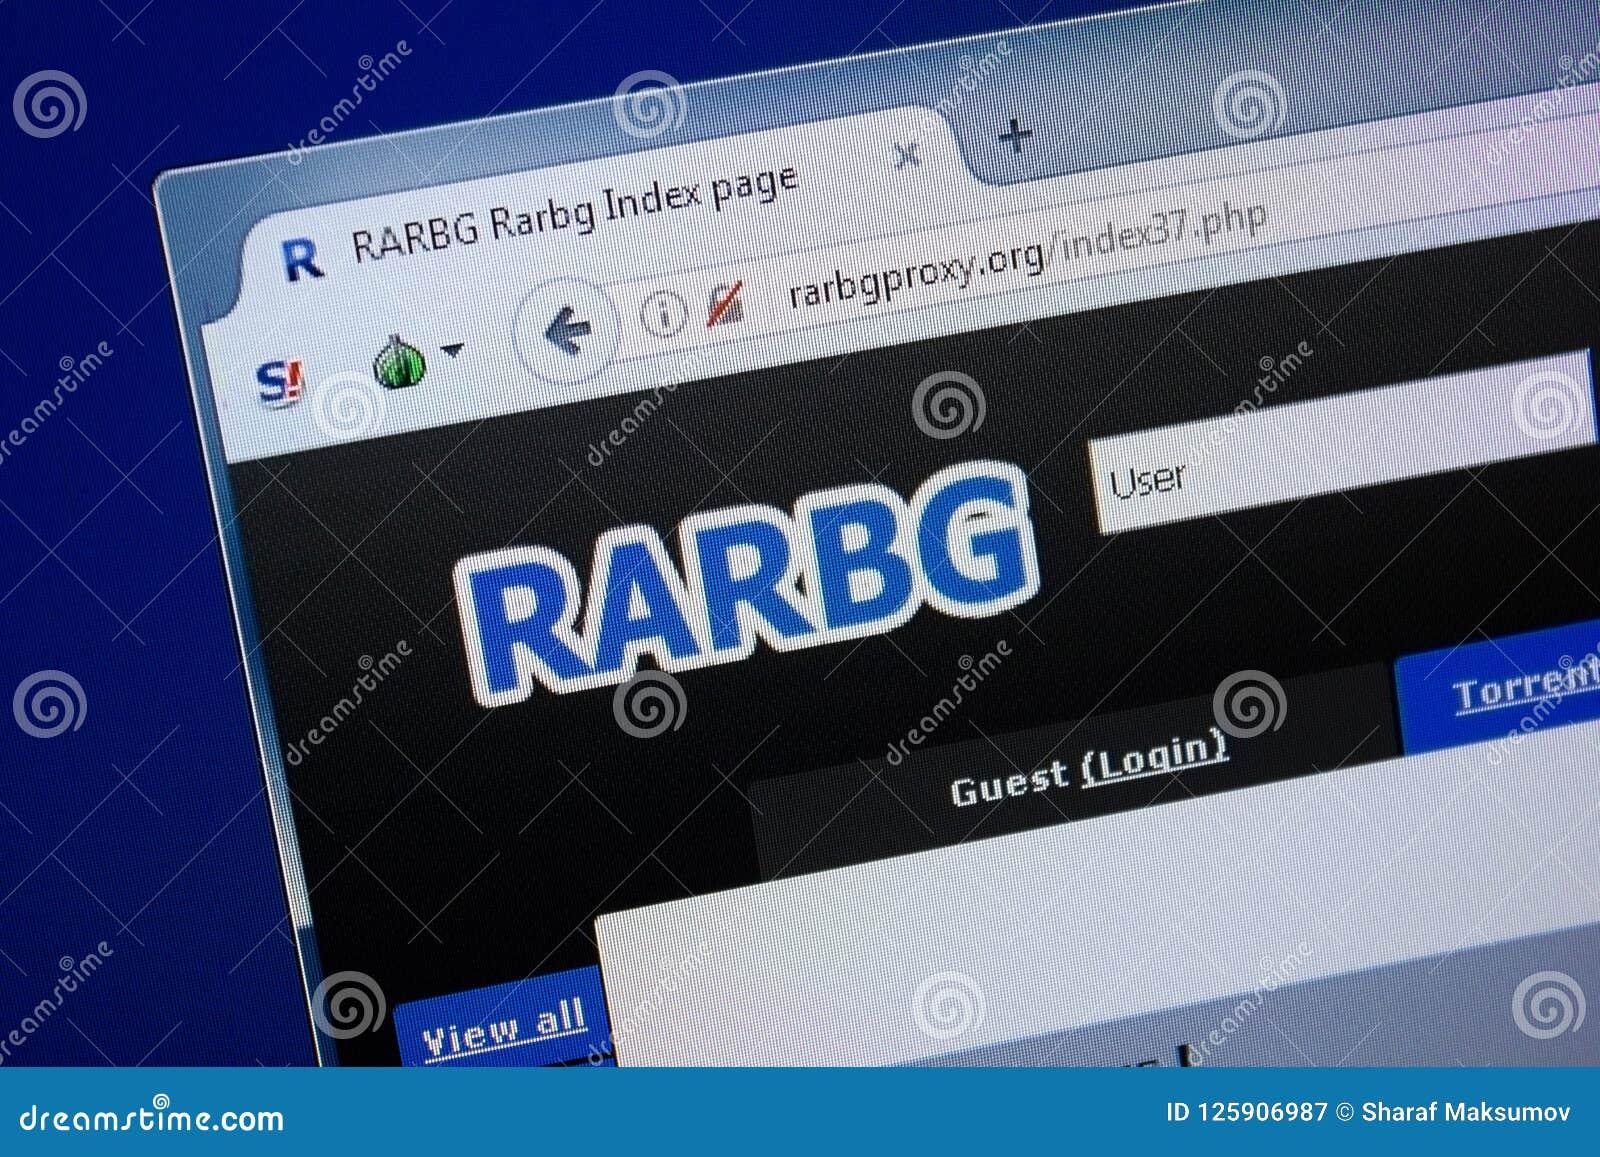 Ryazan, Ρωσία - 9 Σεπτεμβρίου 2018: Αρχική σελίδα Rar BG Proxu του ιστοχώρου στην επίδειξη του PC, url - RarBgProxu org